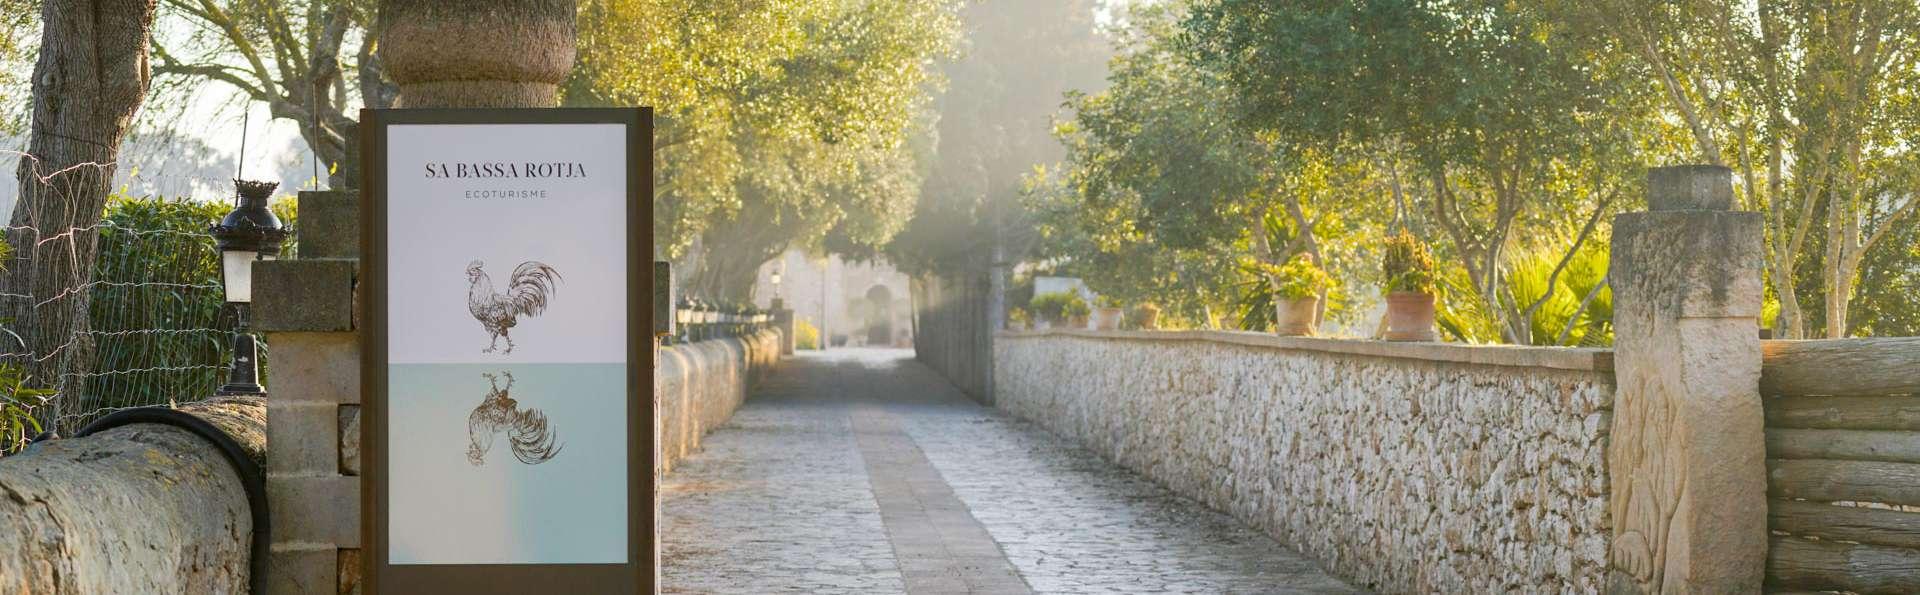 Sa Bassa Rotja Ecoturisme - EDIT_FRONT_01.jpg